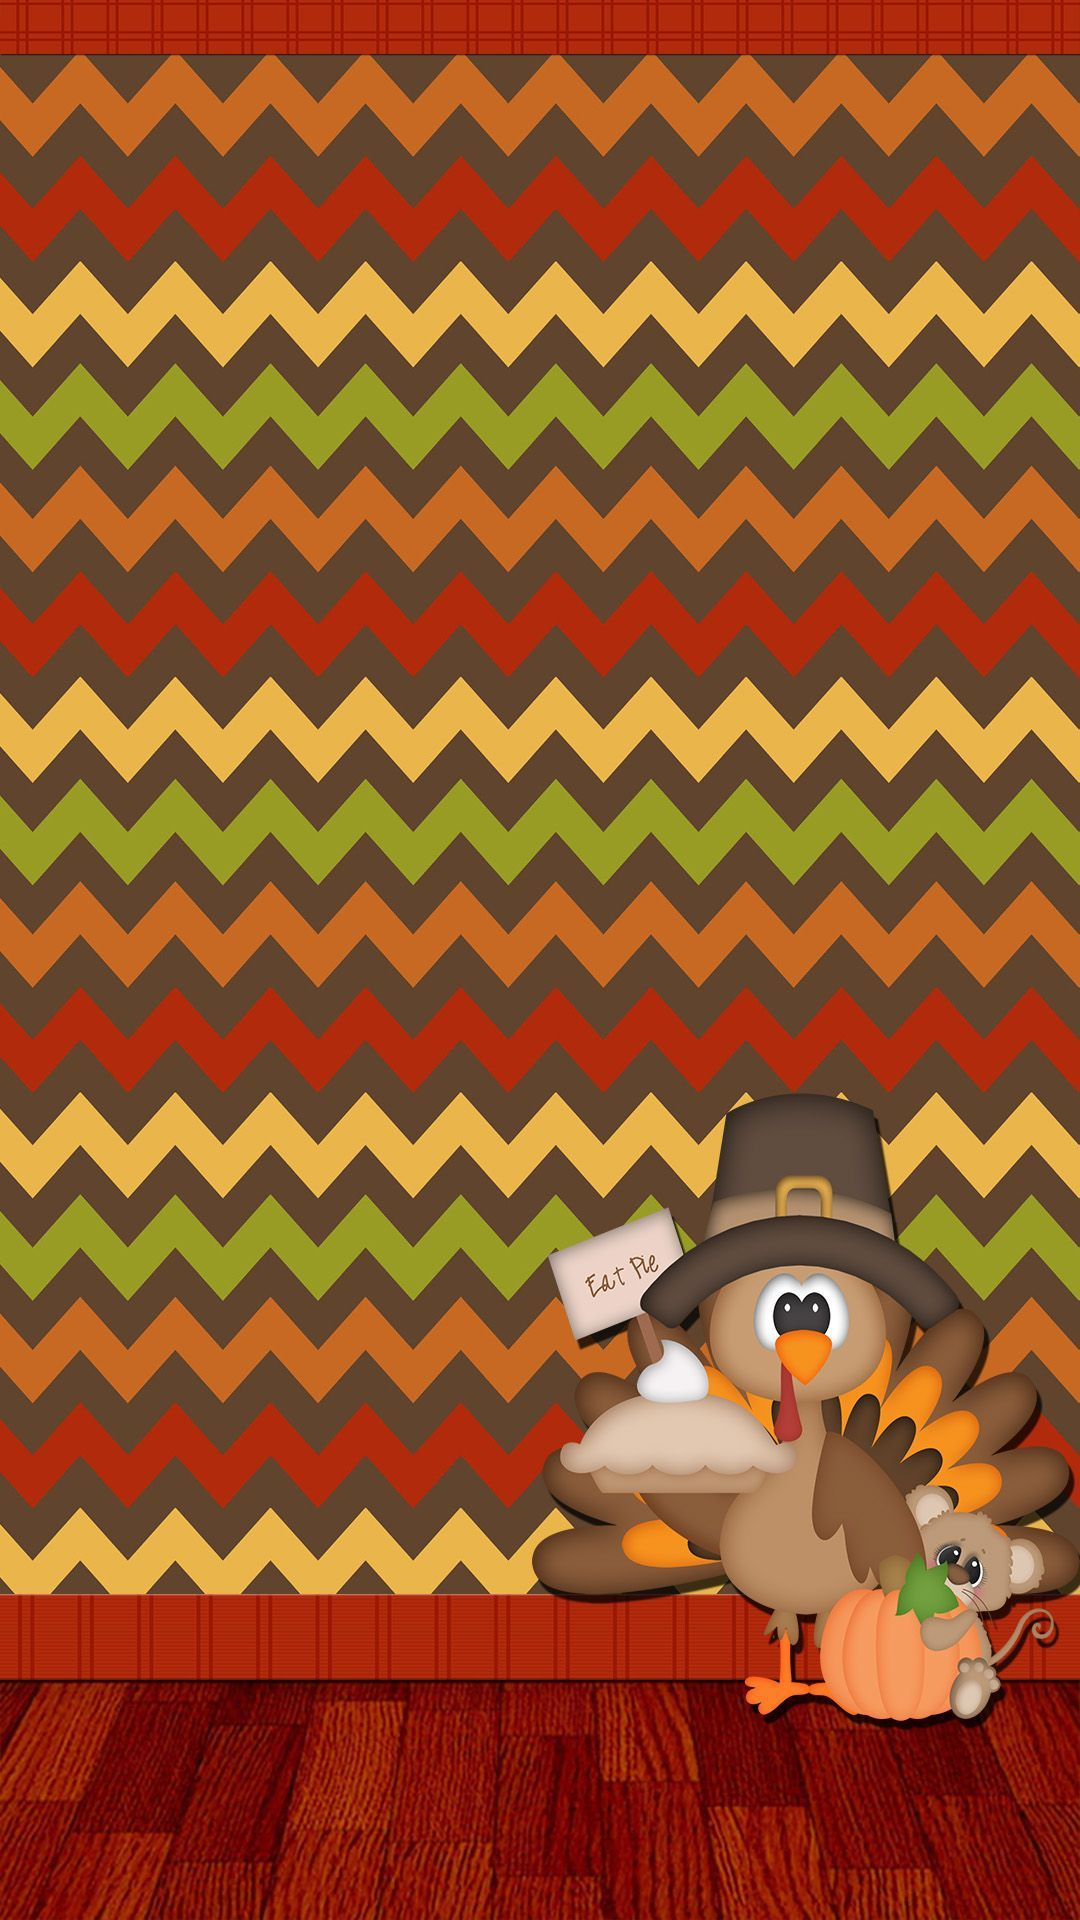 Thanksgiving Phone Wallpapers - Top Free Thanksgiving ...